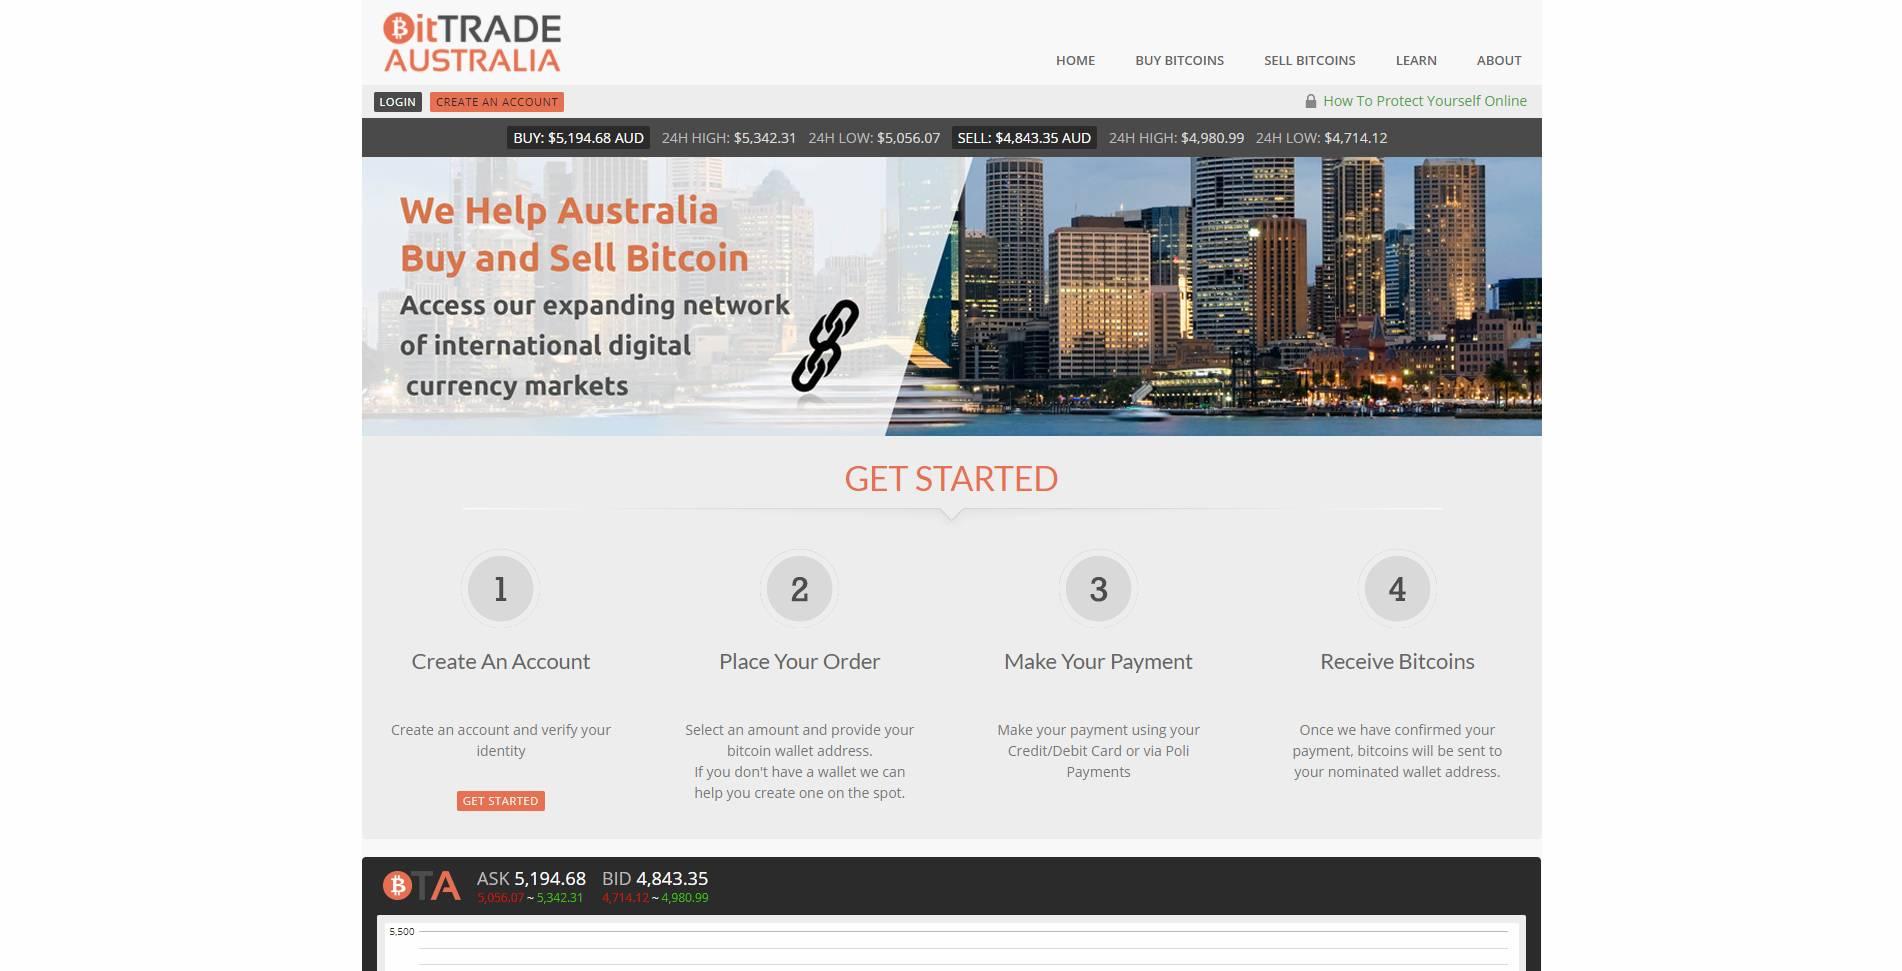 Bit Trade Australia